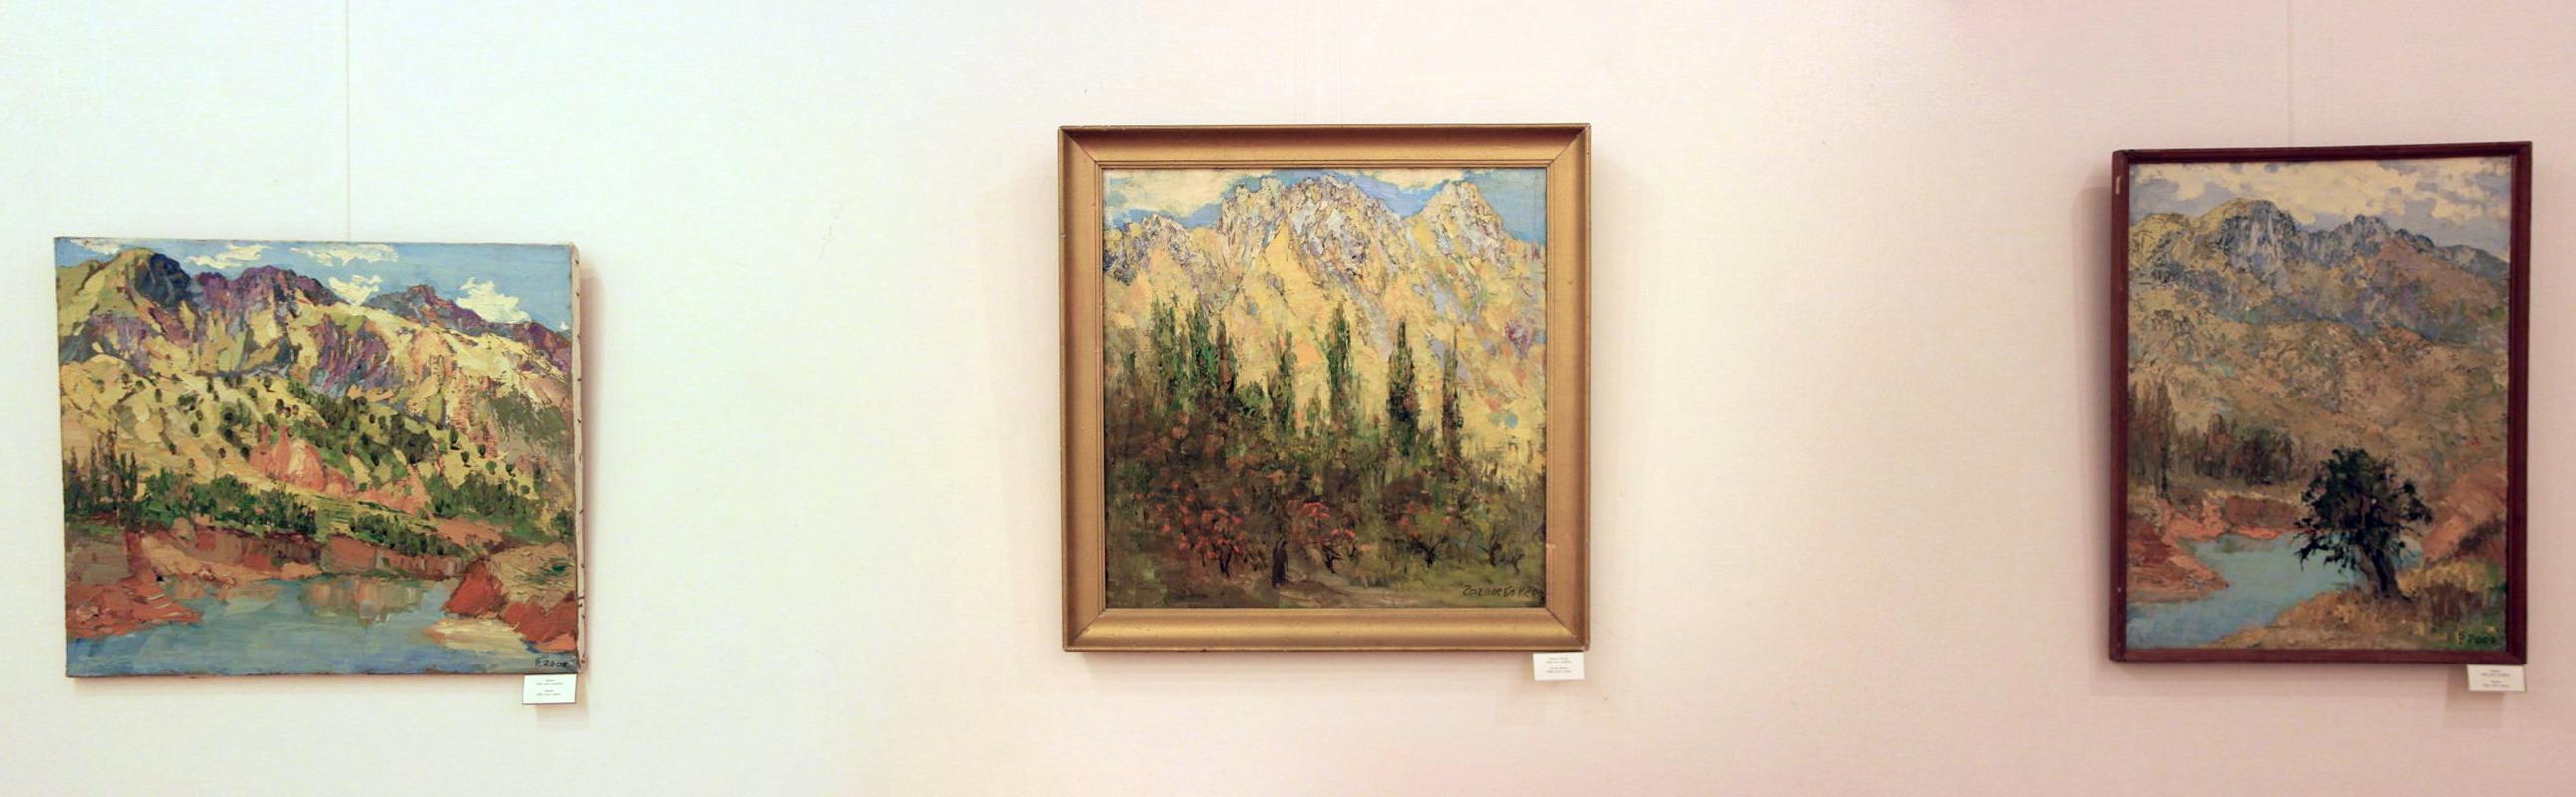 Гаглоева Римма. Экспозиция картин (5)